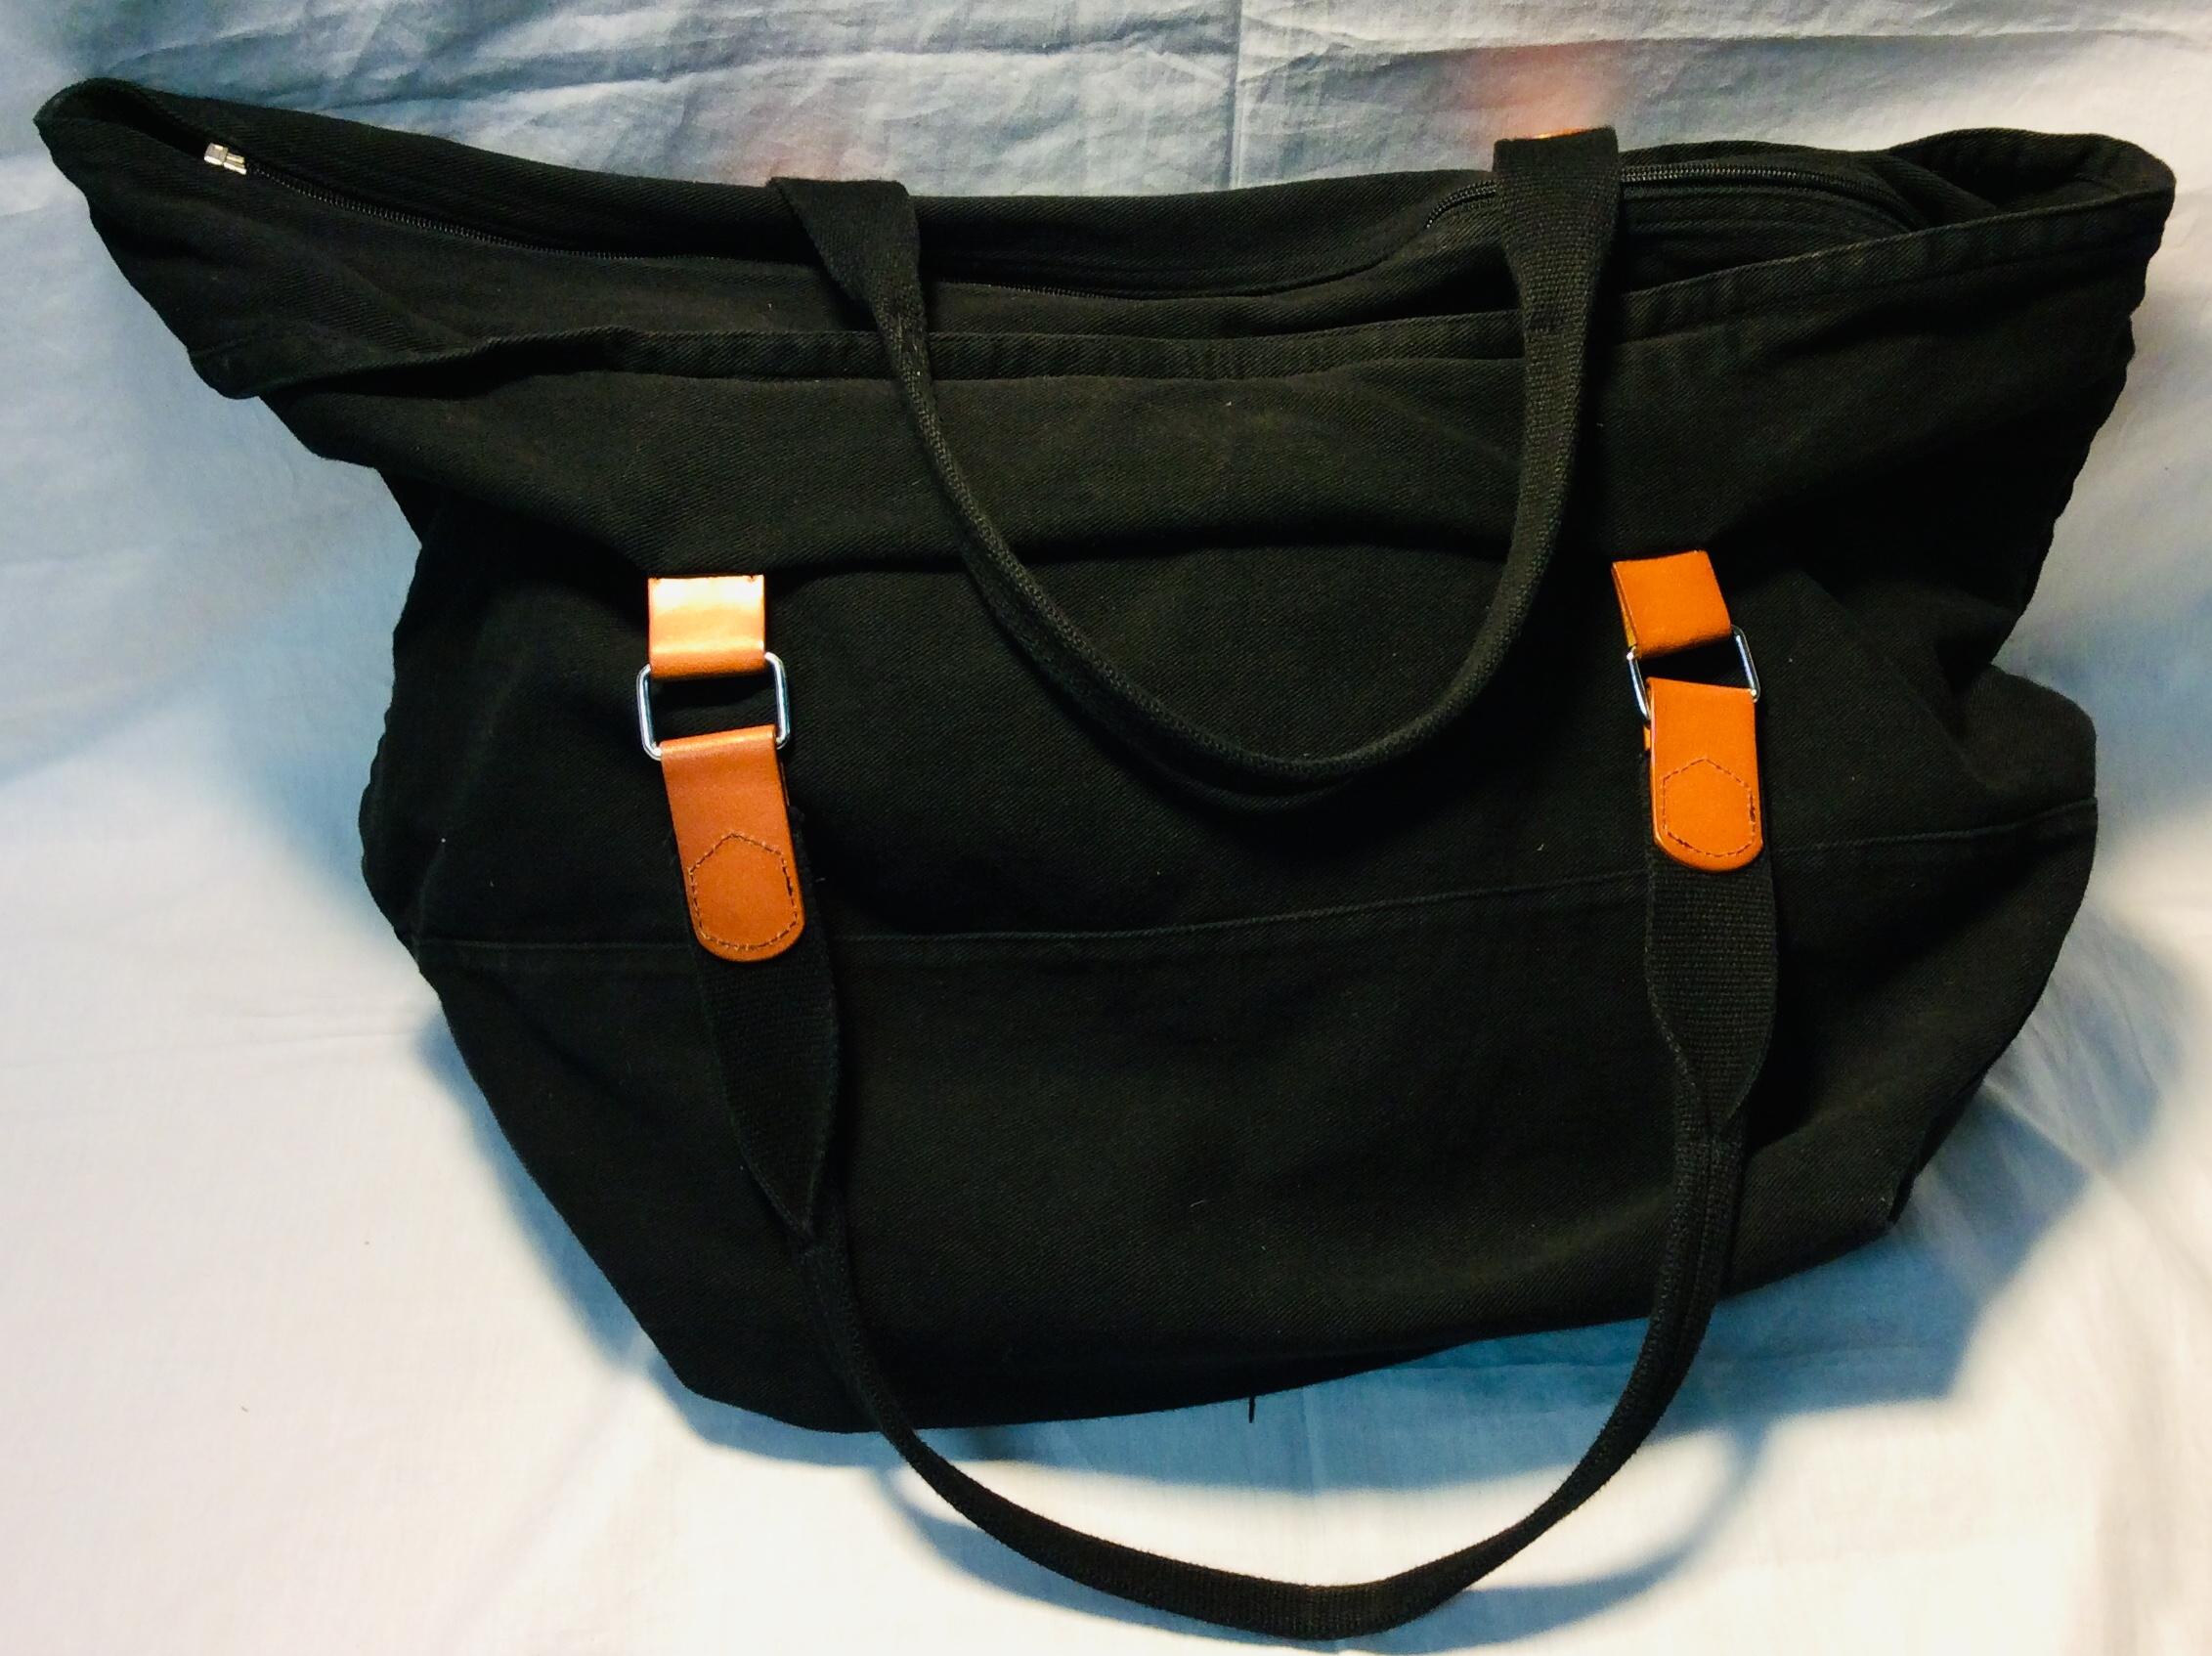 Large, black fabric handbag